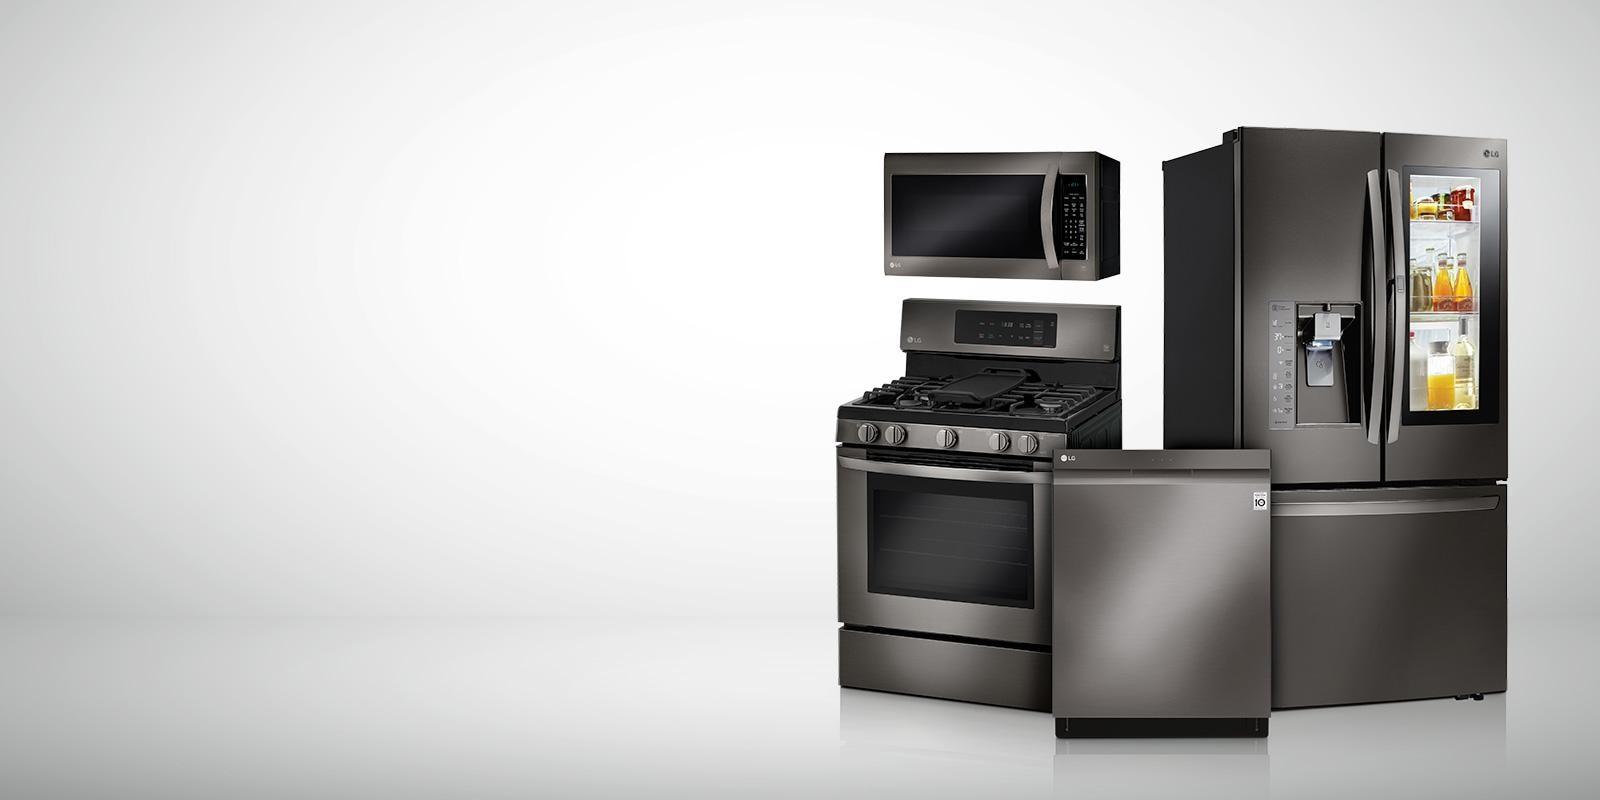 Lg Appliances Compare Kitchen Amp Home Appliances Lg Usa